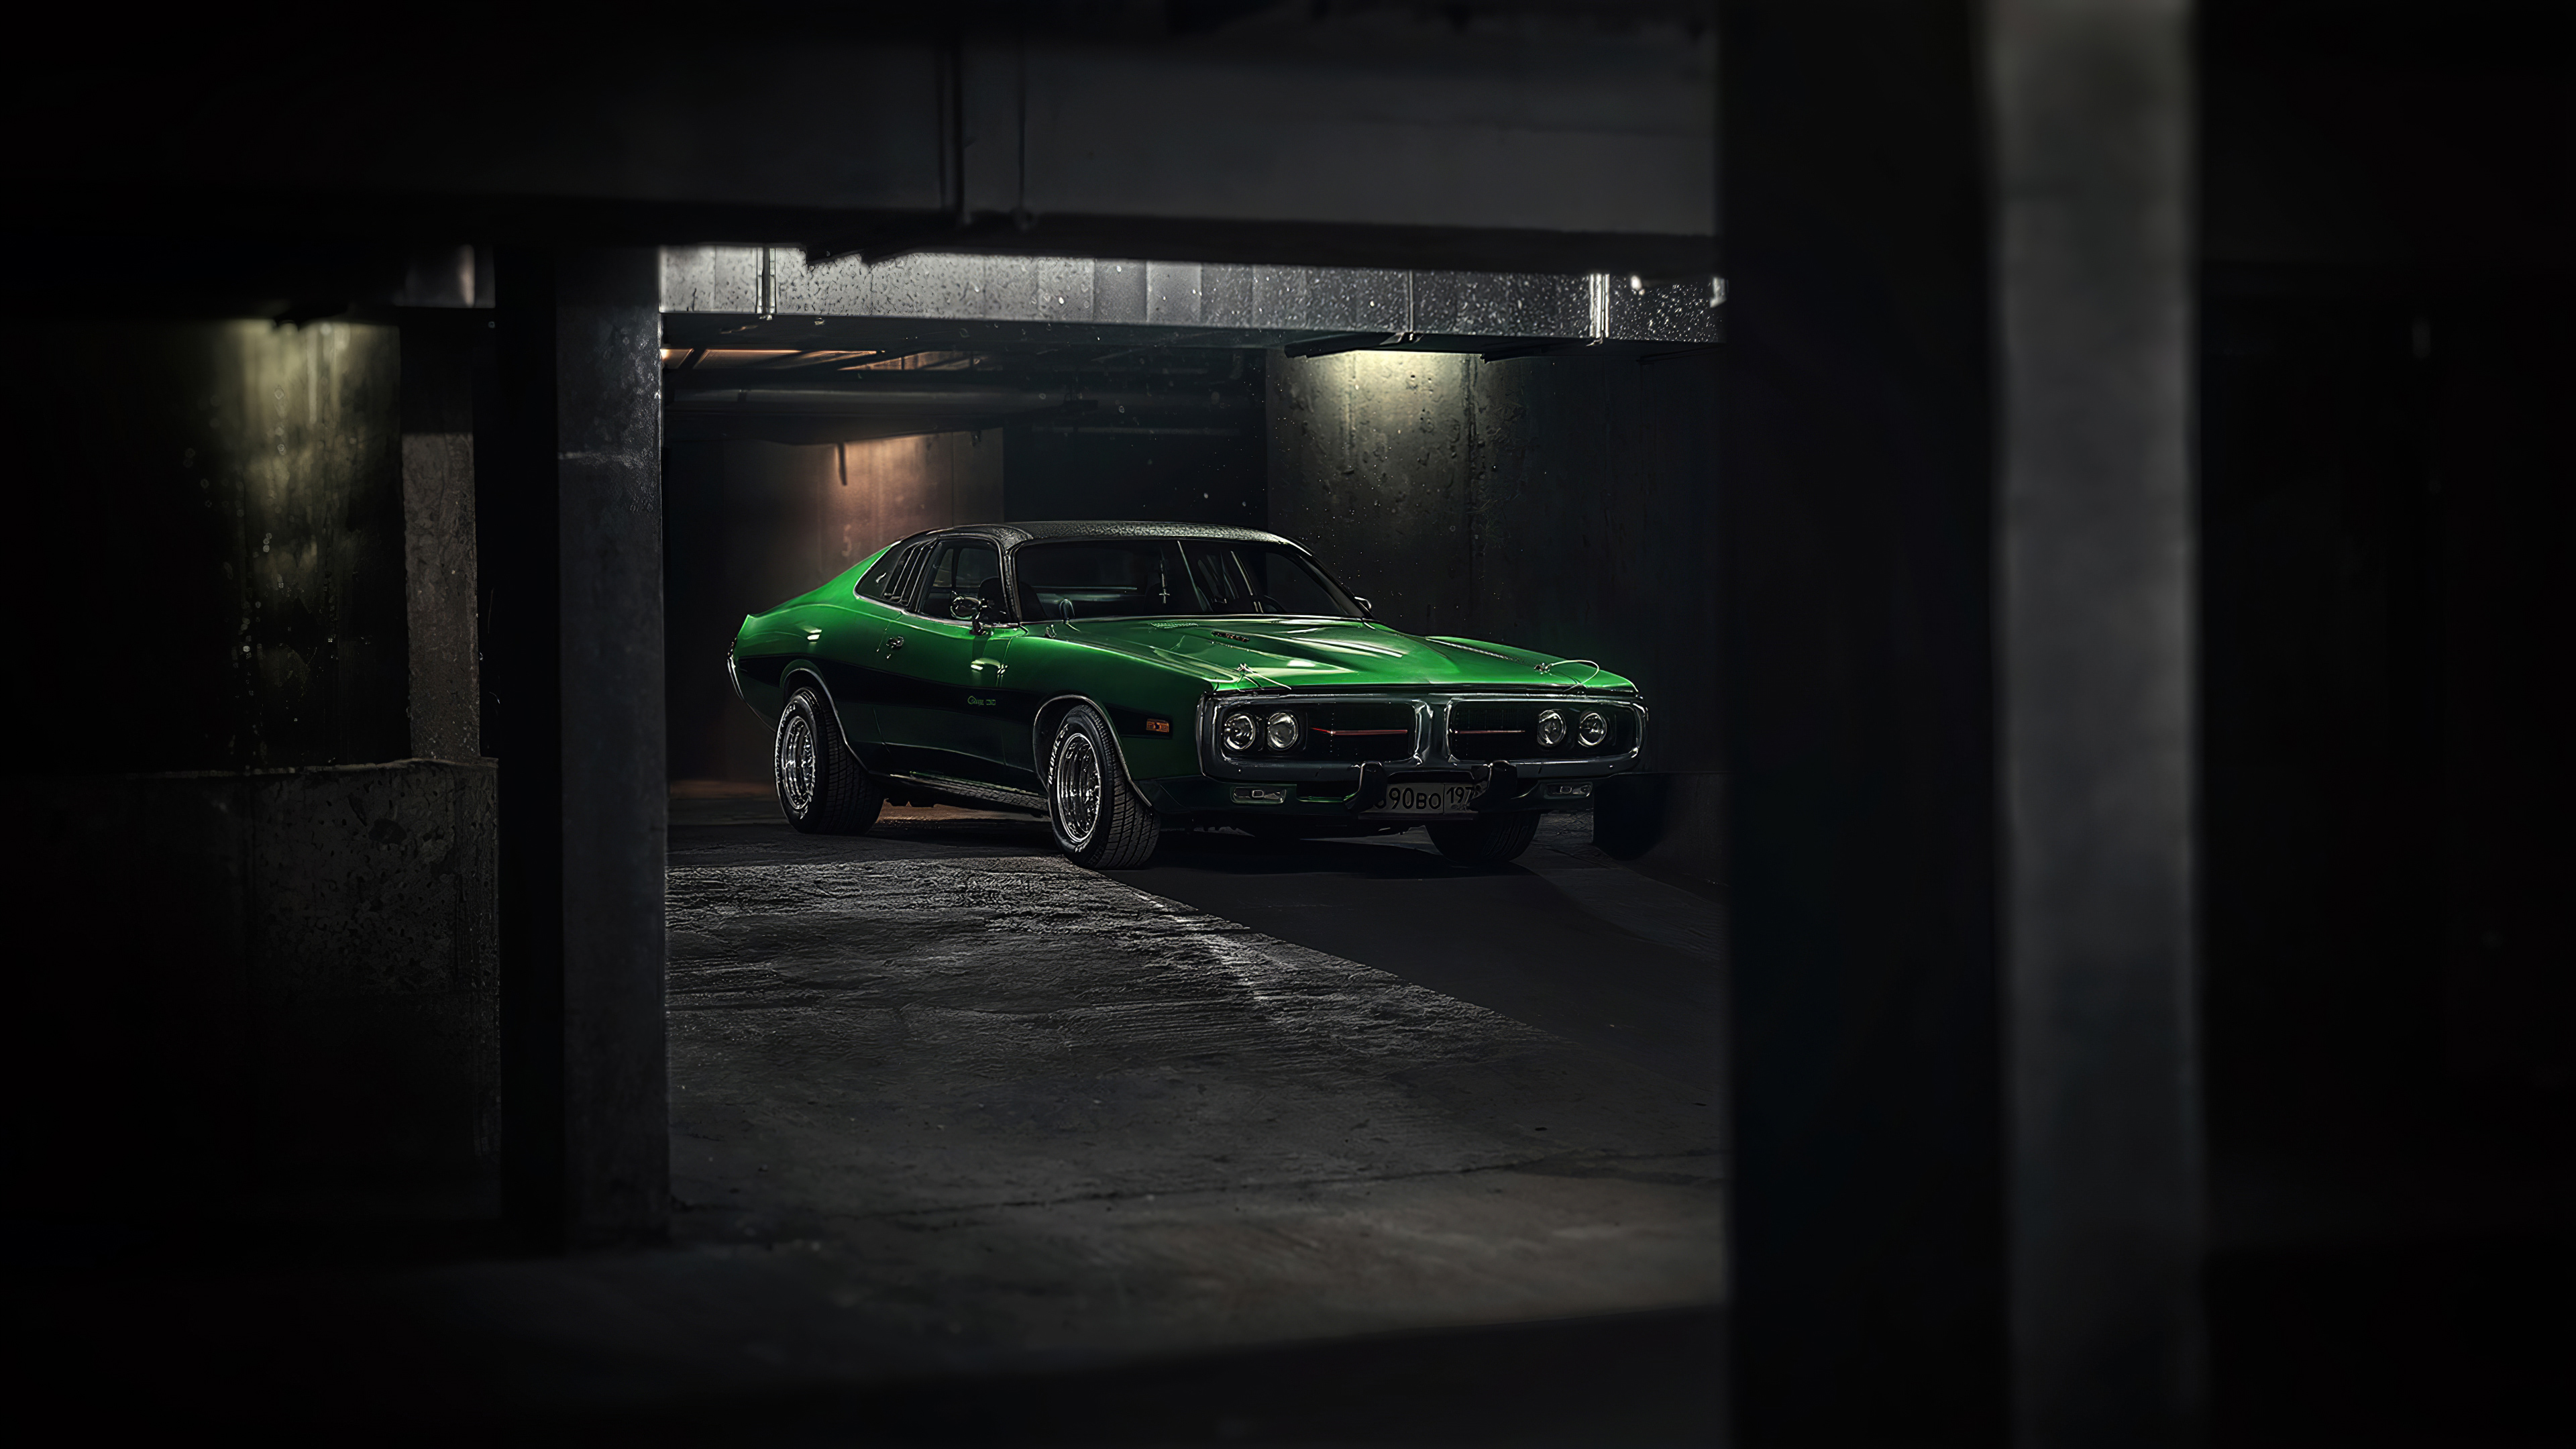 dodge charger muscle car 1577653844 - Dodge Charger Muscle Car - Dodge Charger Muscle Car 4k wallpaper, dodge charger 4k wallpaper